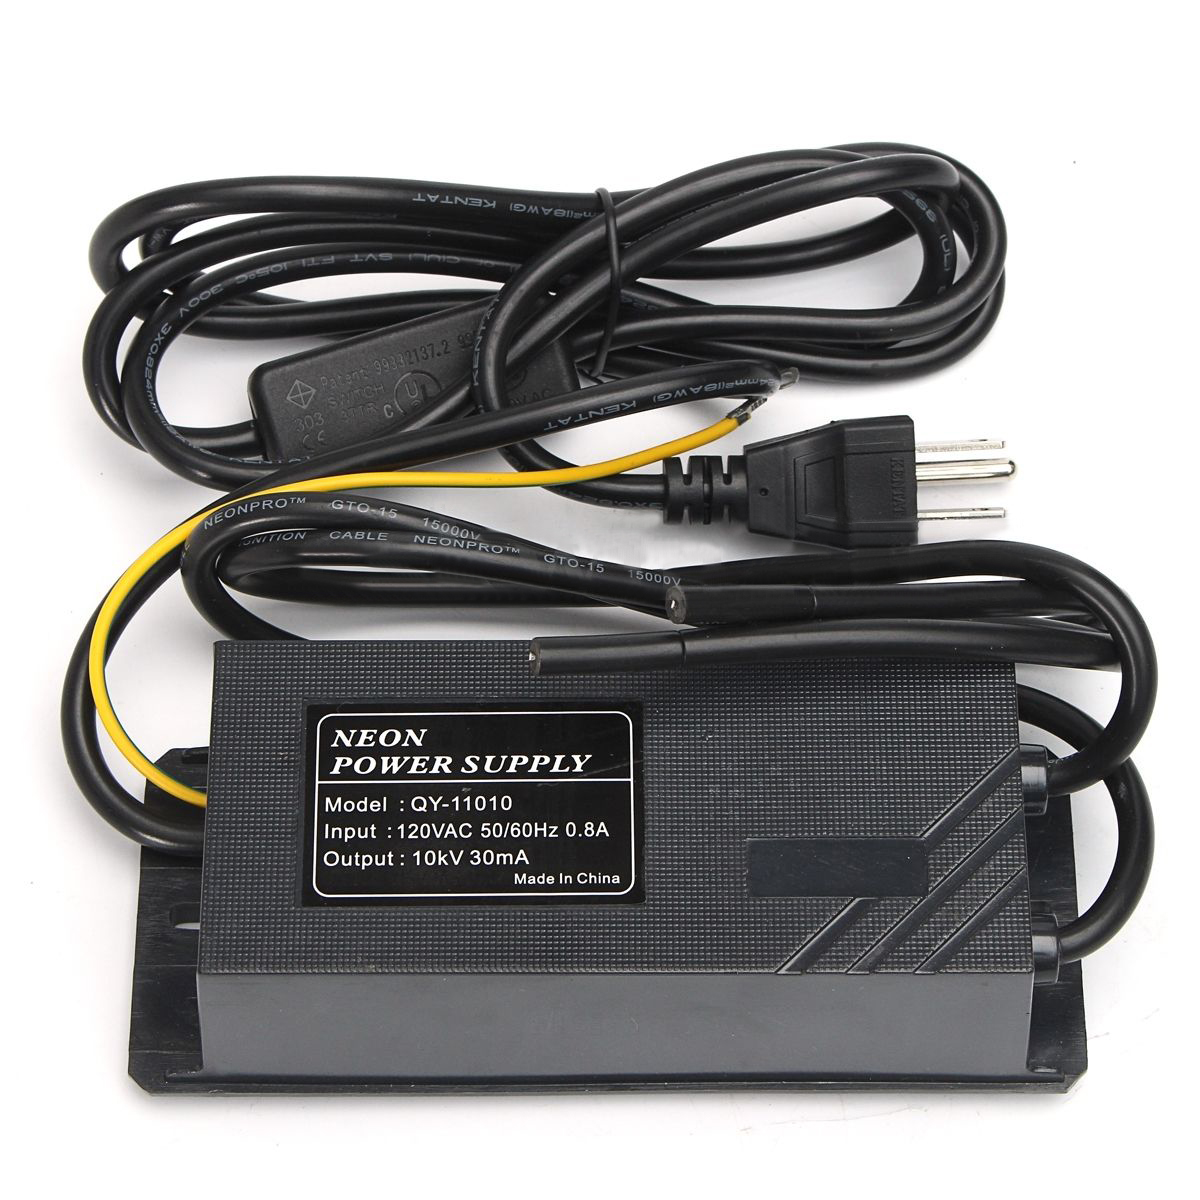 IKVVT New 10KV 30mA 110V Black Neon Electronic Transformer Power Supply Rectifier Kit